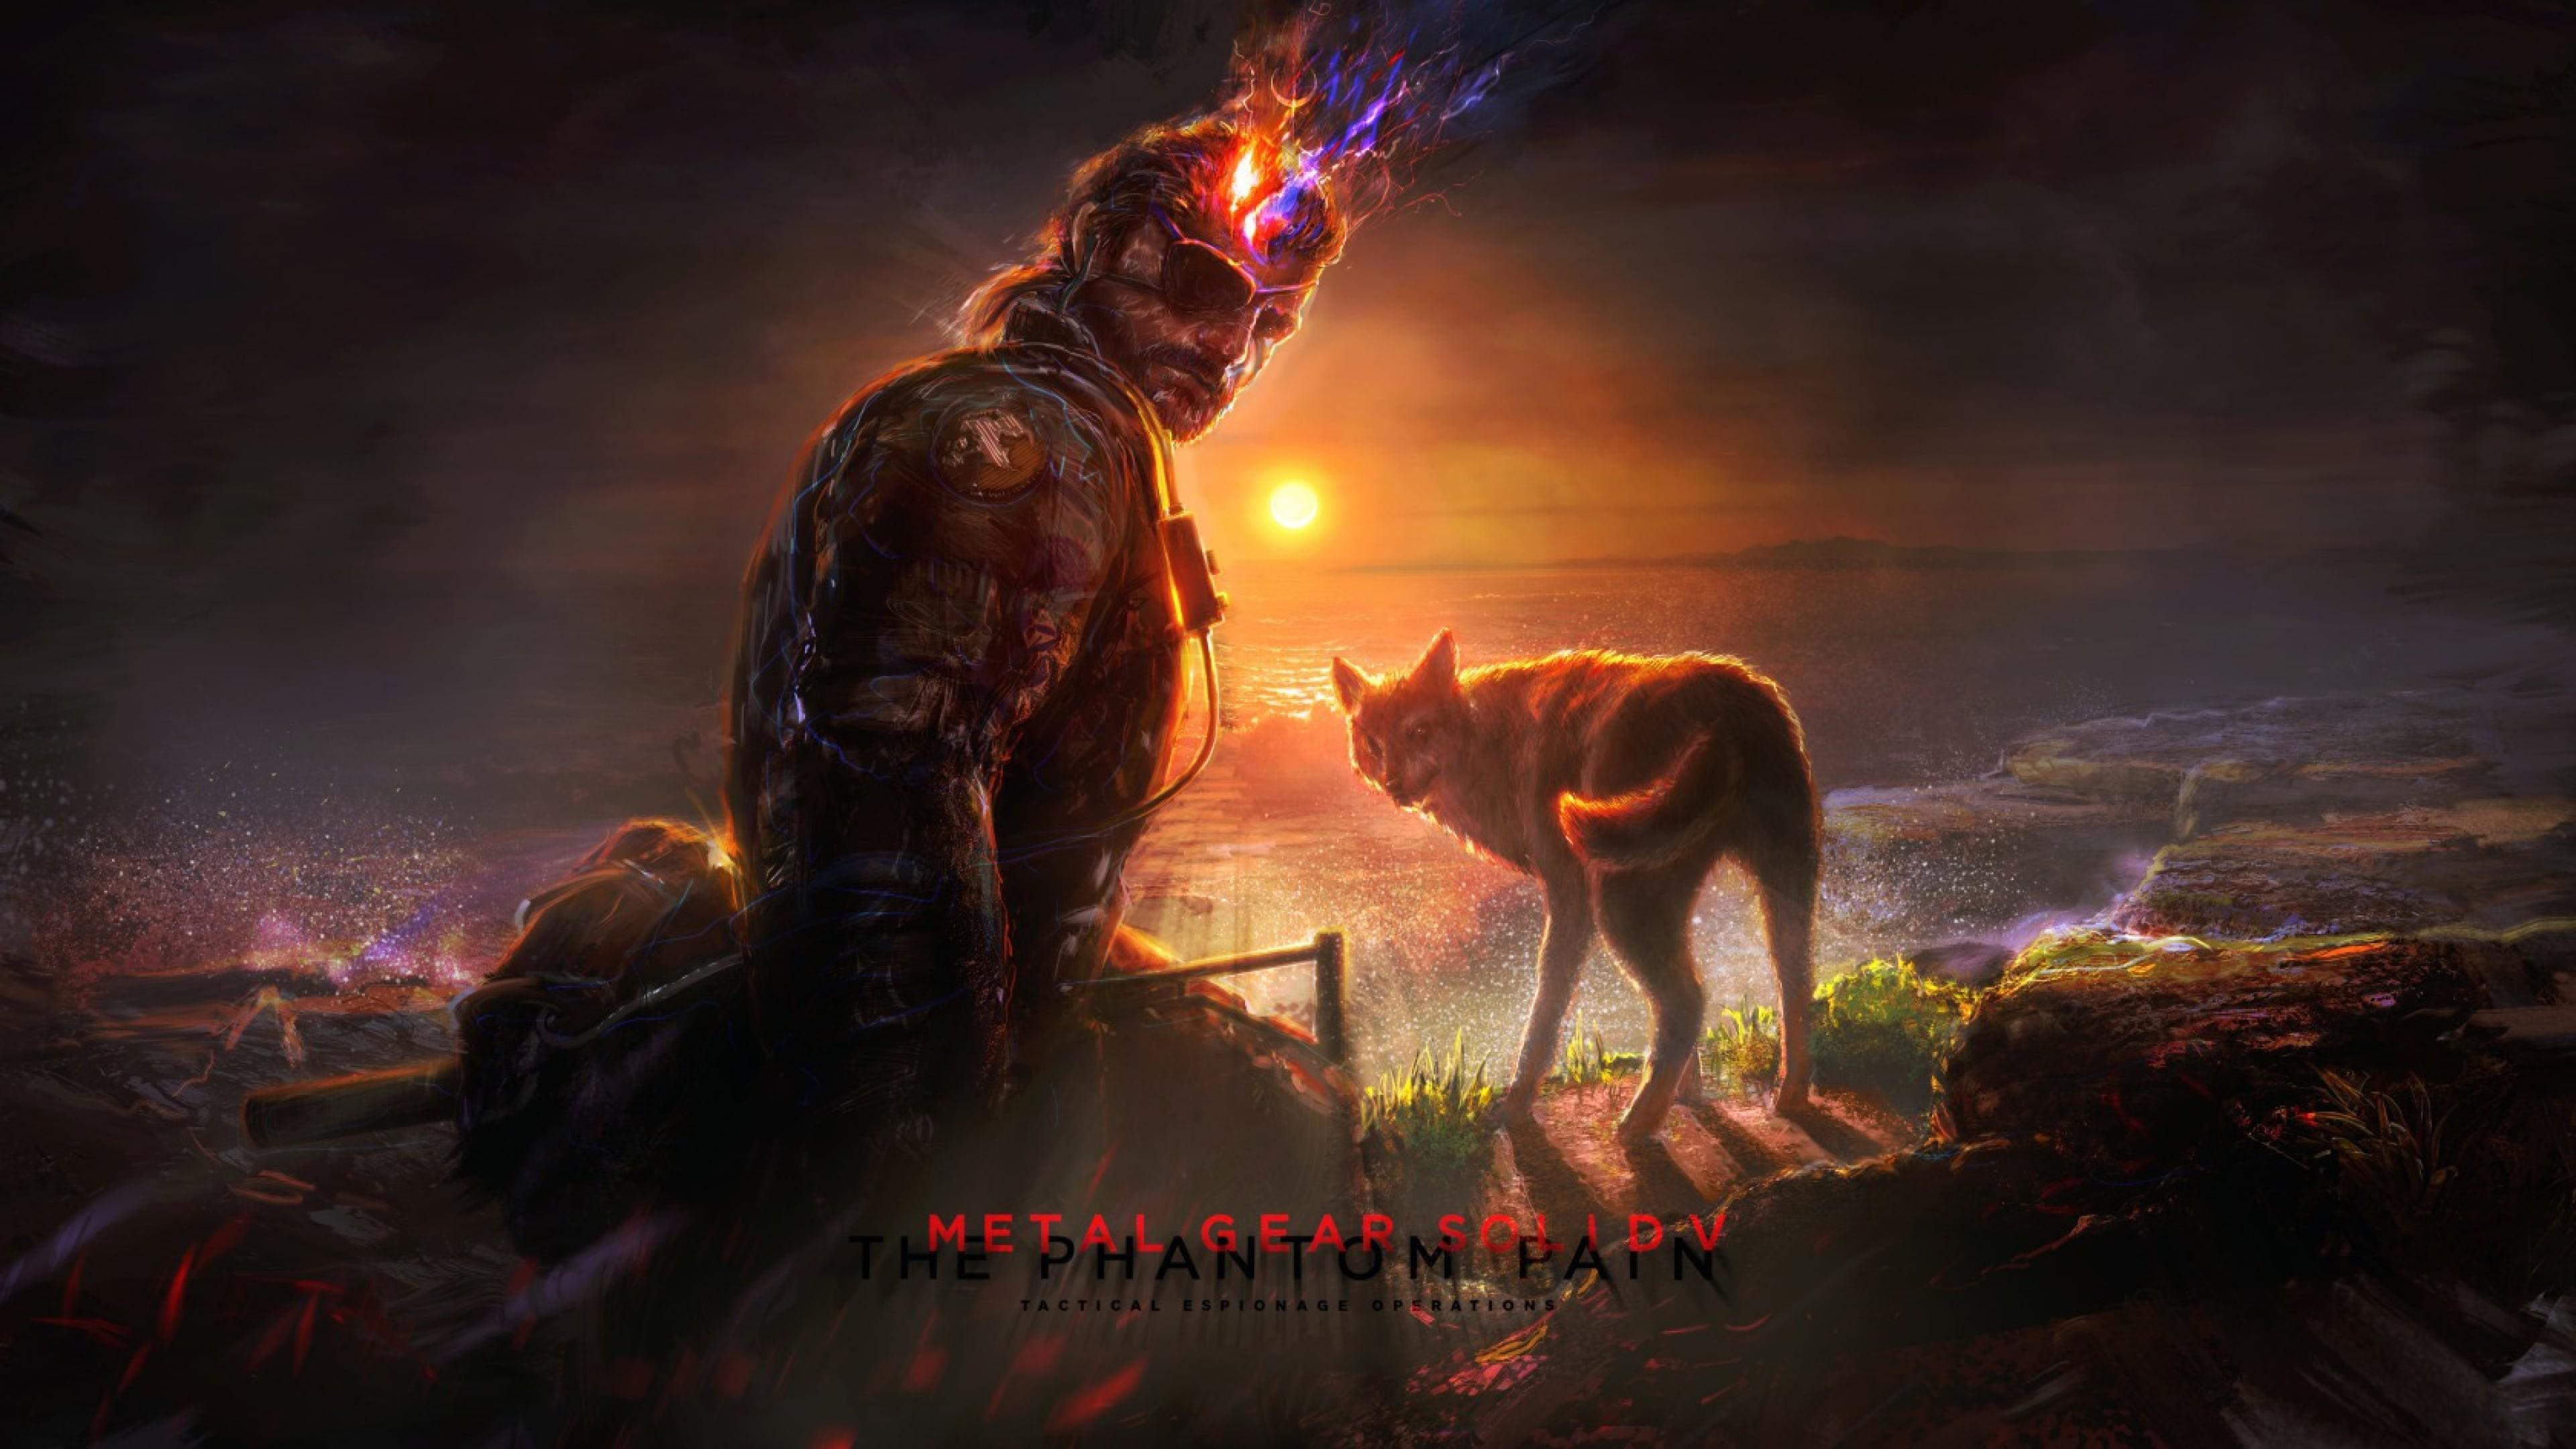 Metal Gear Solid 5 The Phantom Pain fox 1080p